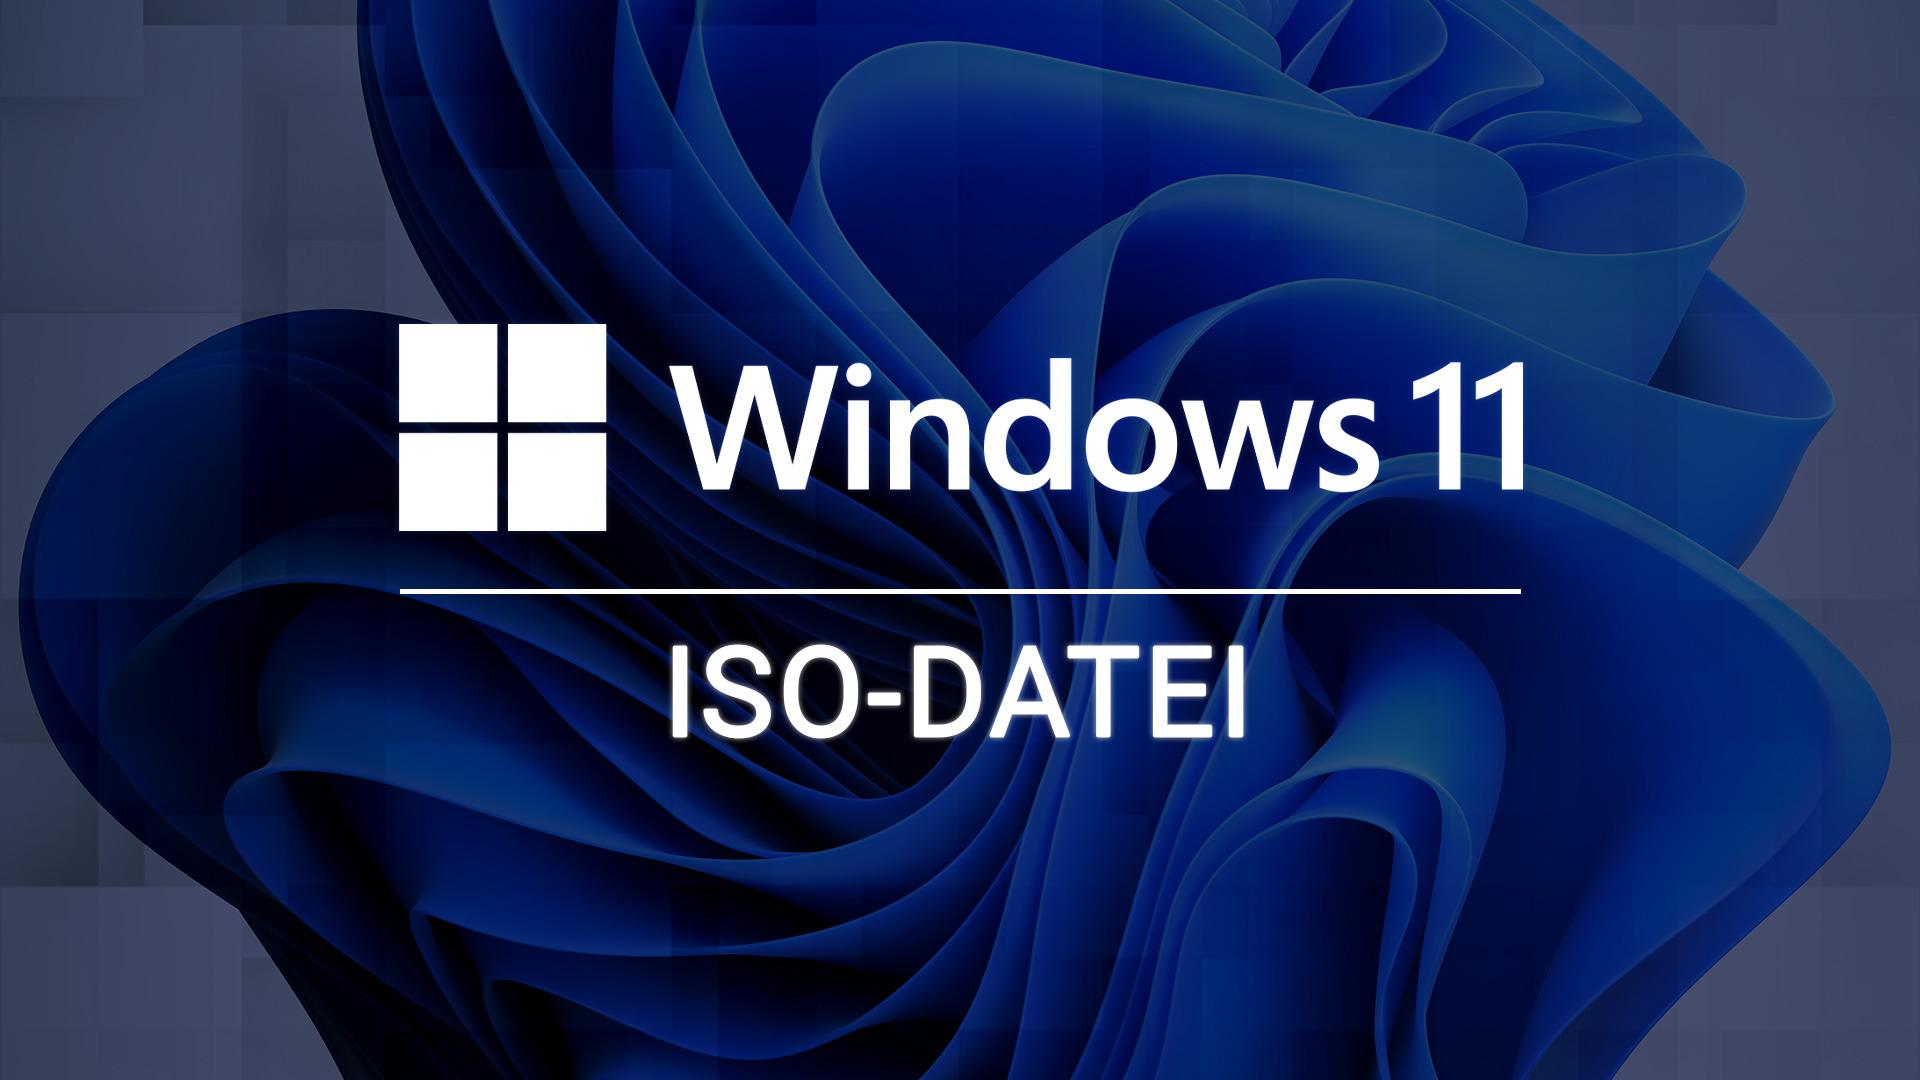 Microsoft, Windows 11, ISO-Datei, Windows 11 ISO, ISO Image